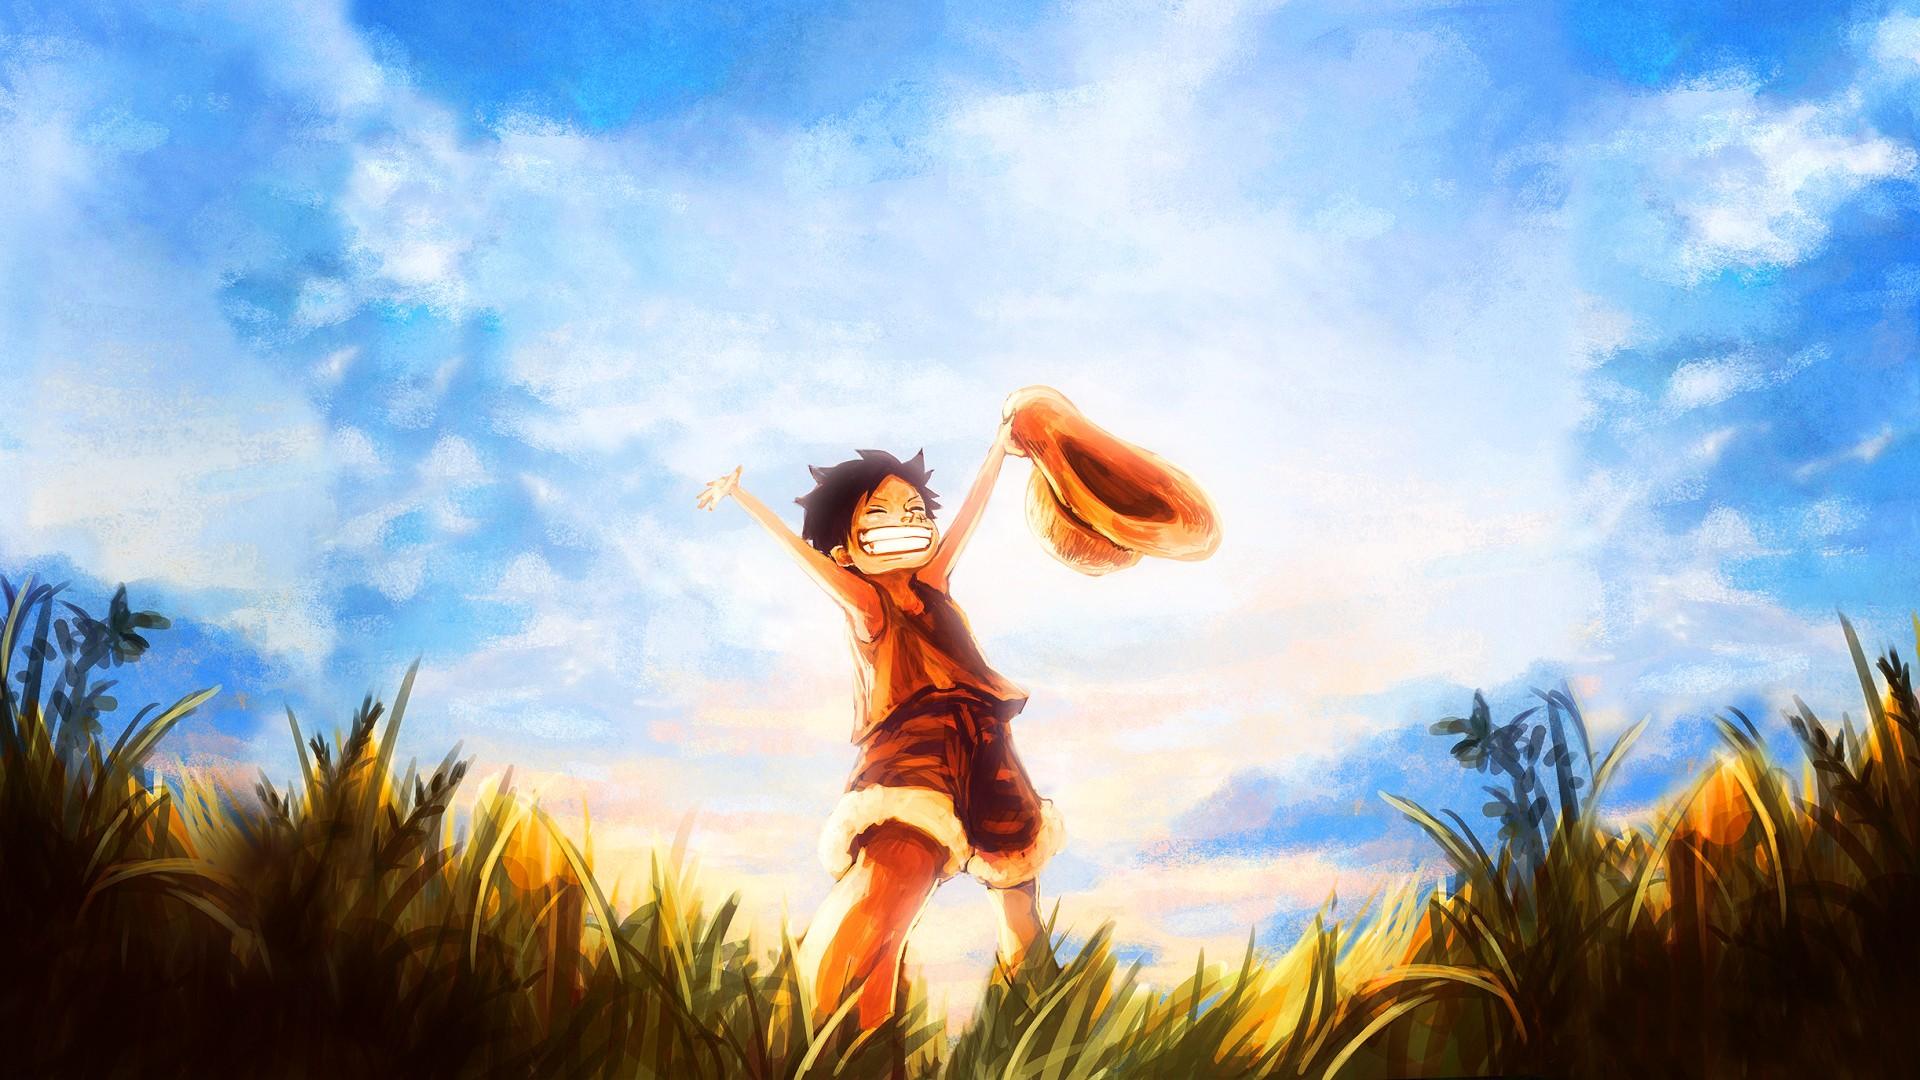 Wallpaper Sunlight Sunset Anime Boys Sky Clouds